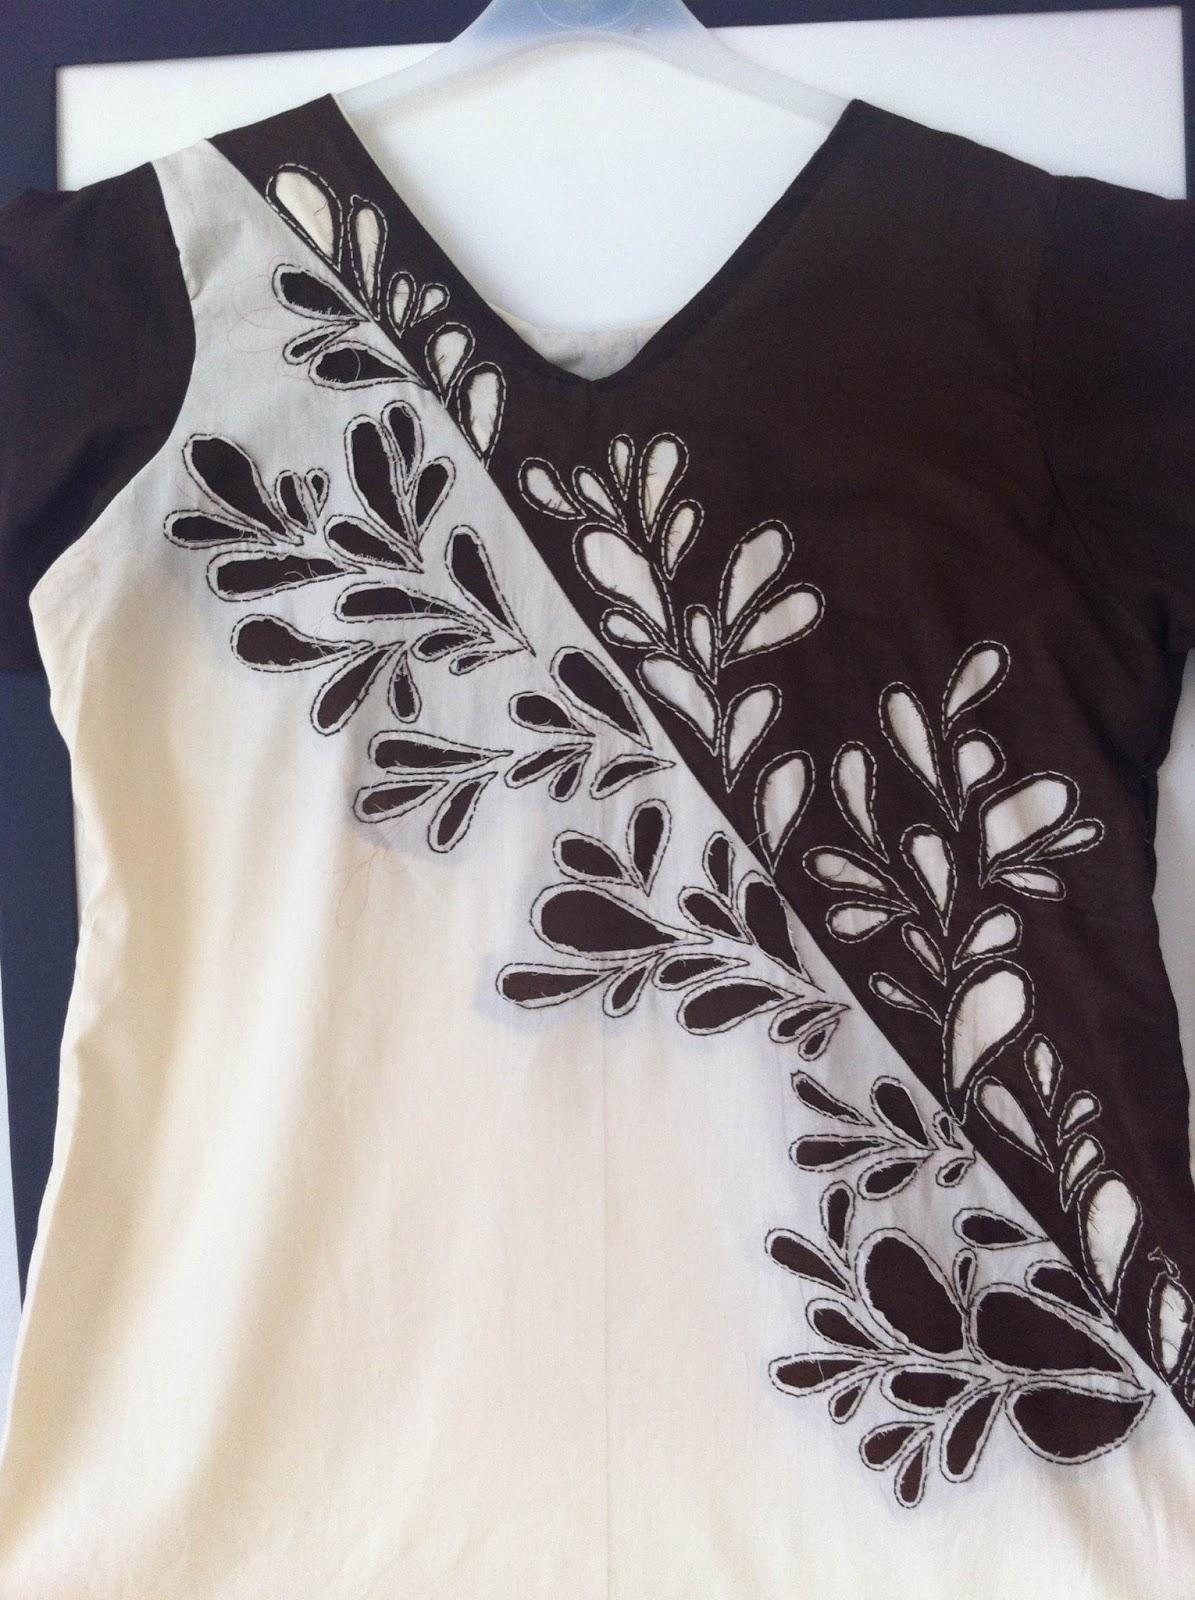 Sew Simple Dress: Reverse appliqué